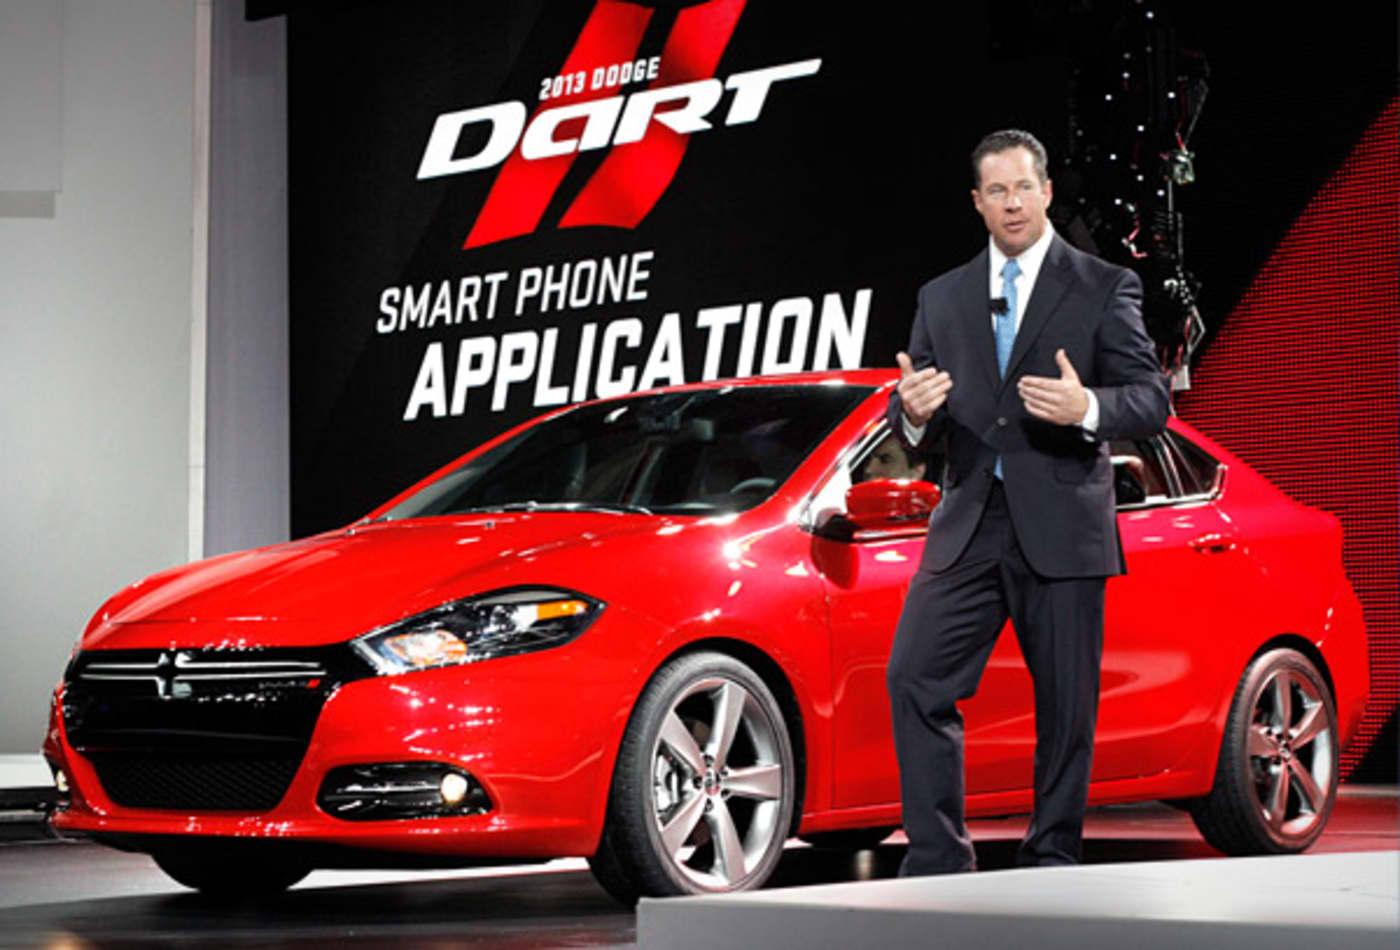 2013-Dodge-Dart.jpg